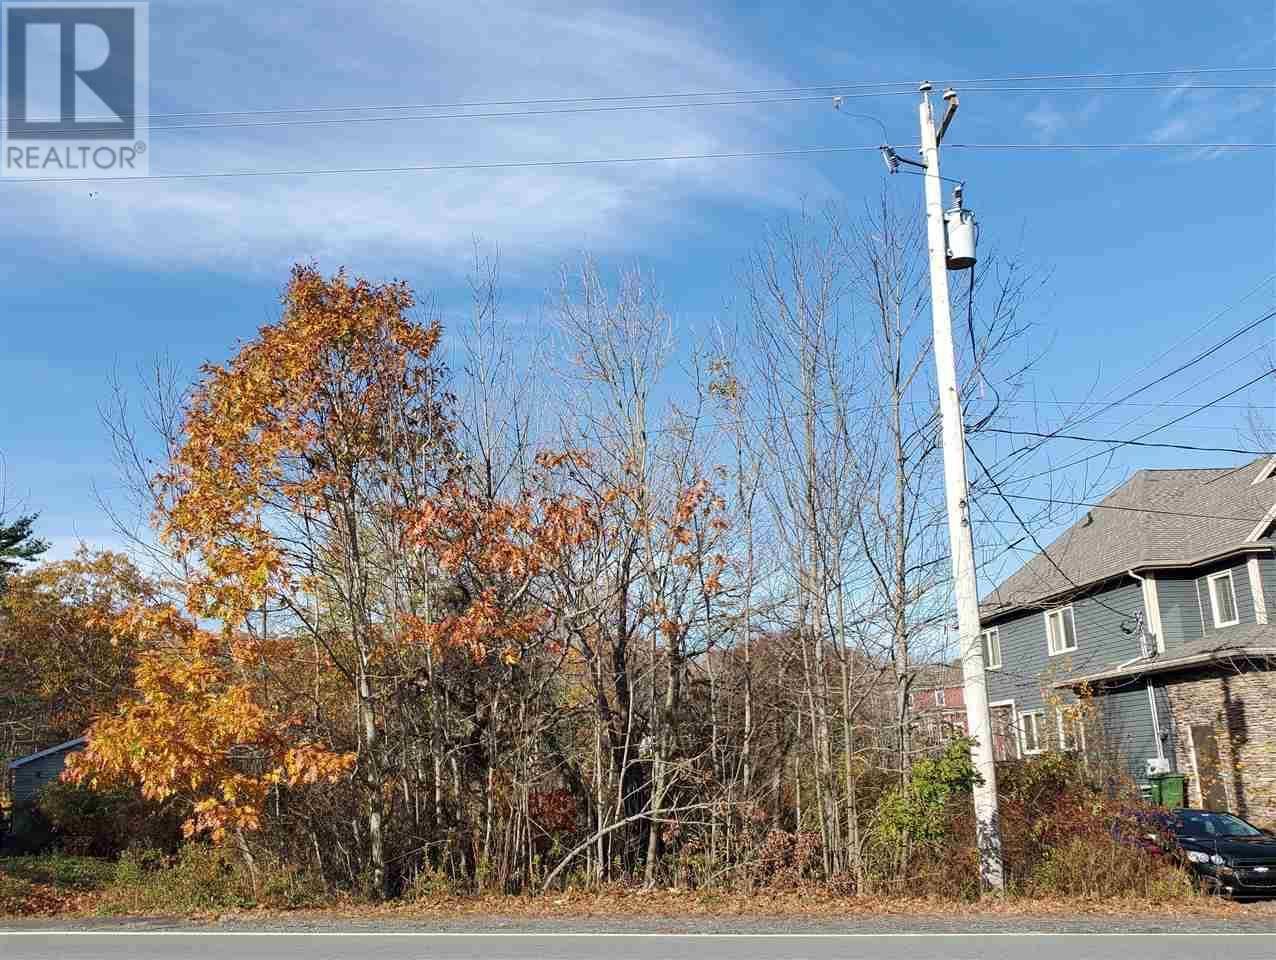 Residential property for sale at 64 Williams Lake Rd Williams Lake Nova Scotia - MLS: 201925401